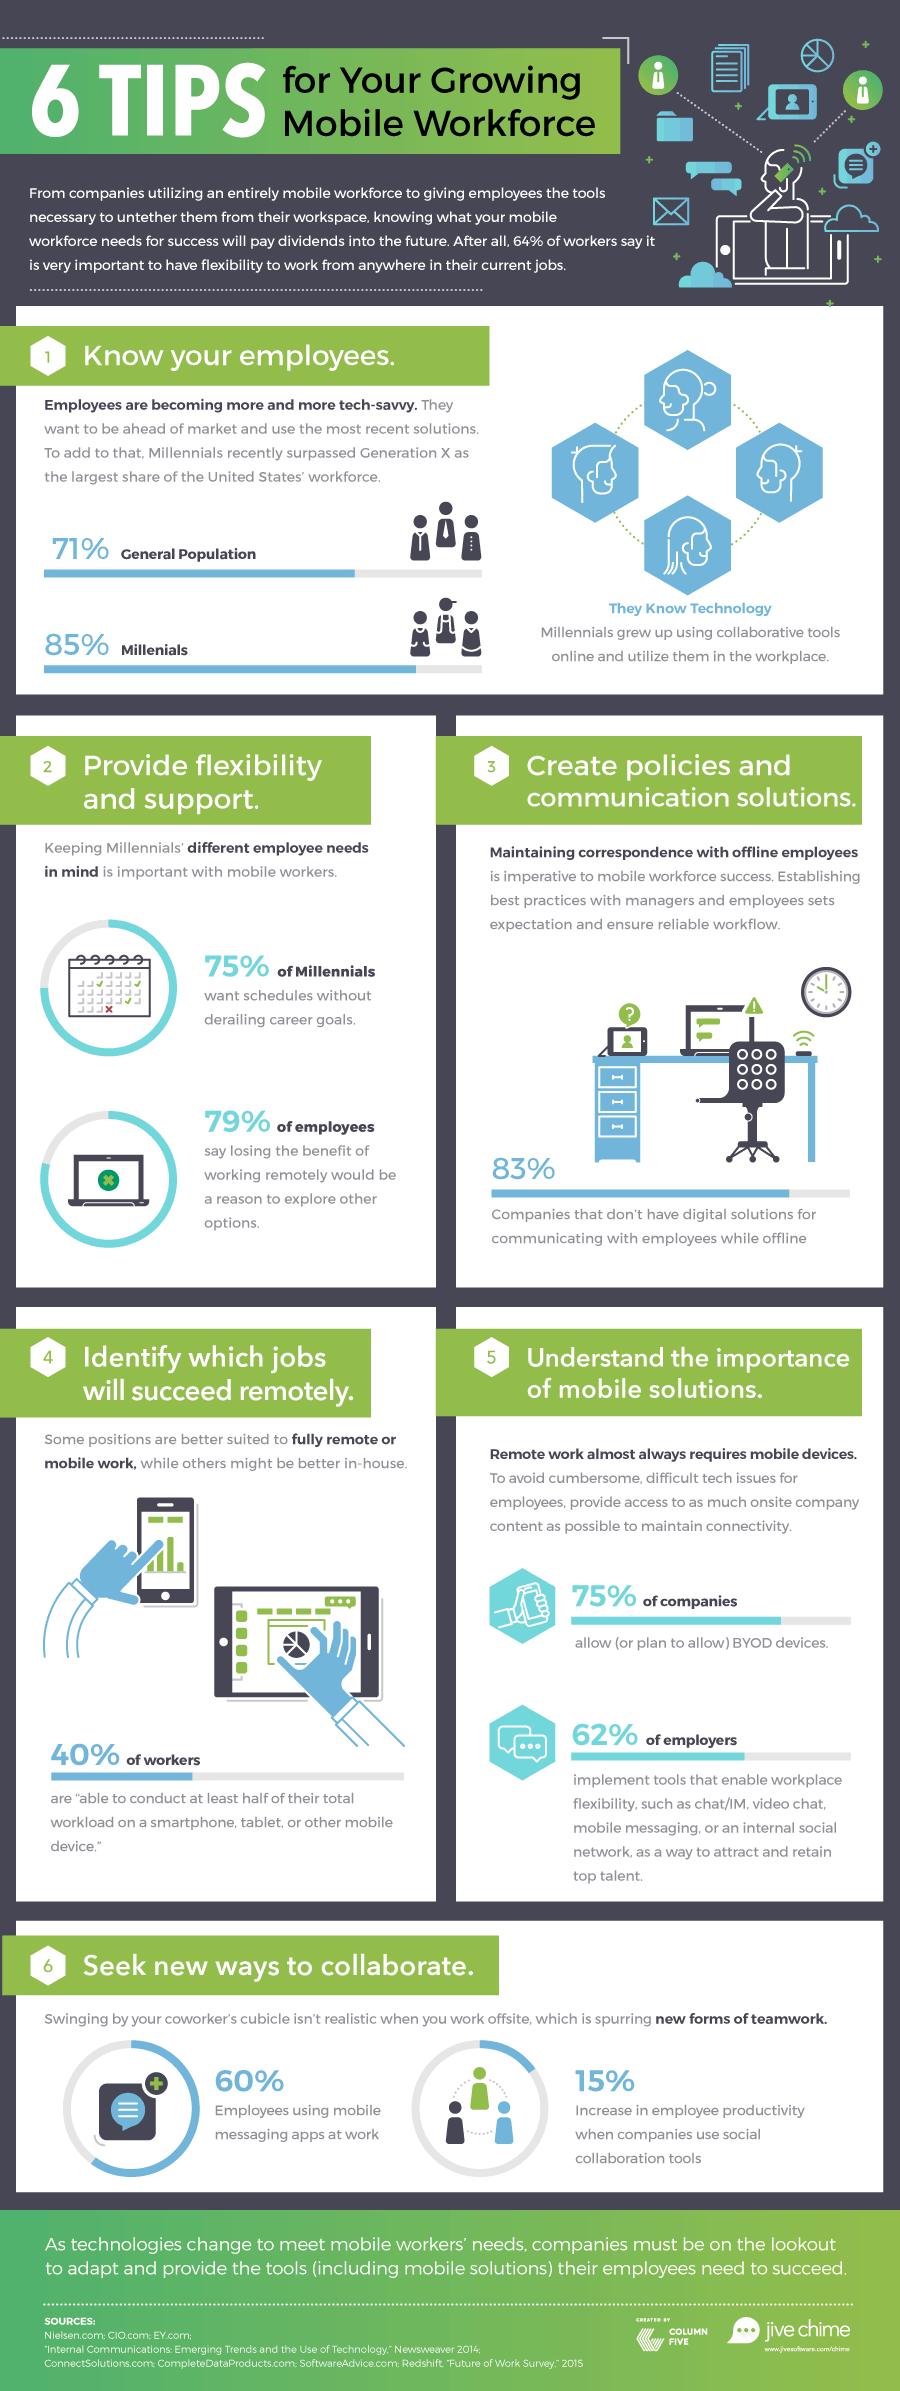 Jive-w_ChimeMobileWorkforce_infographic